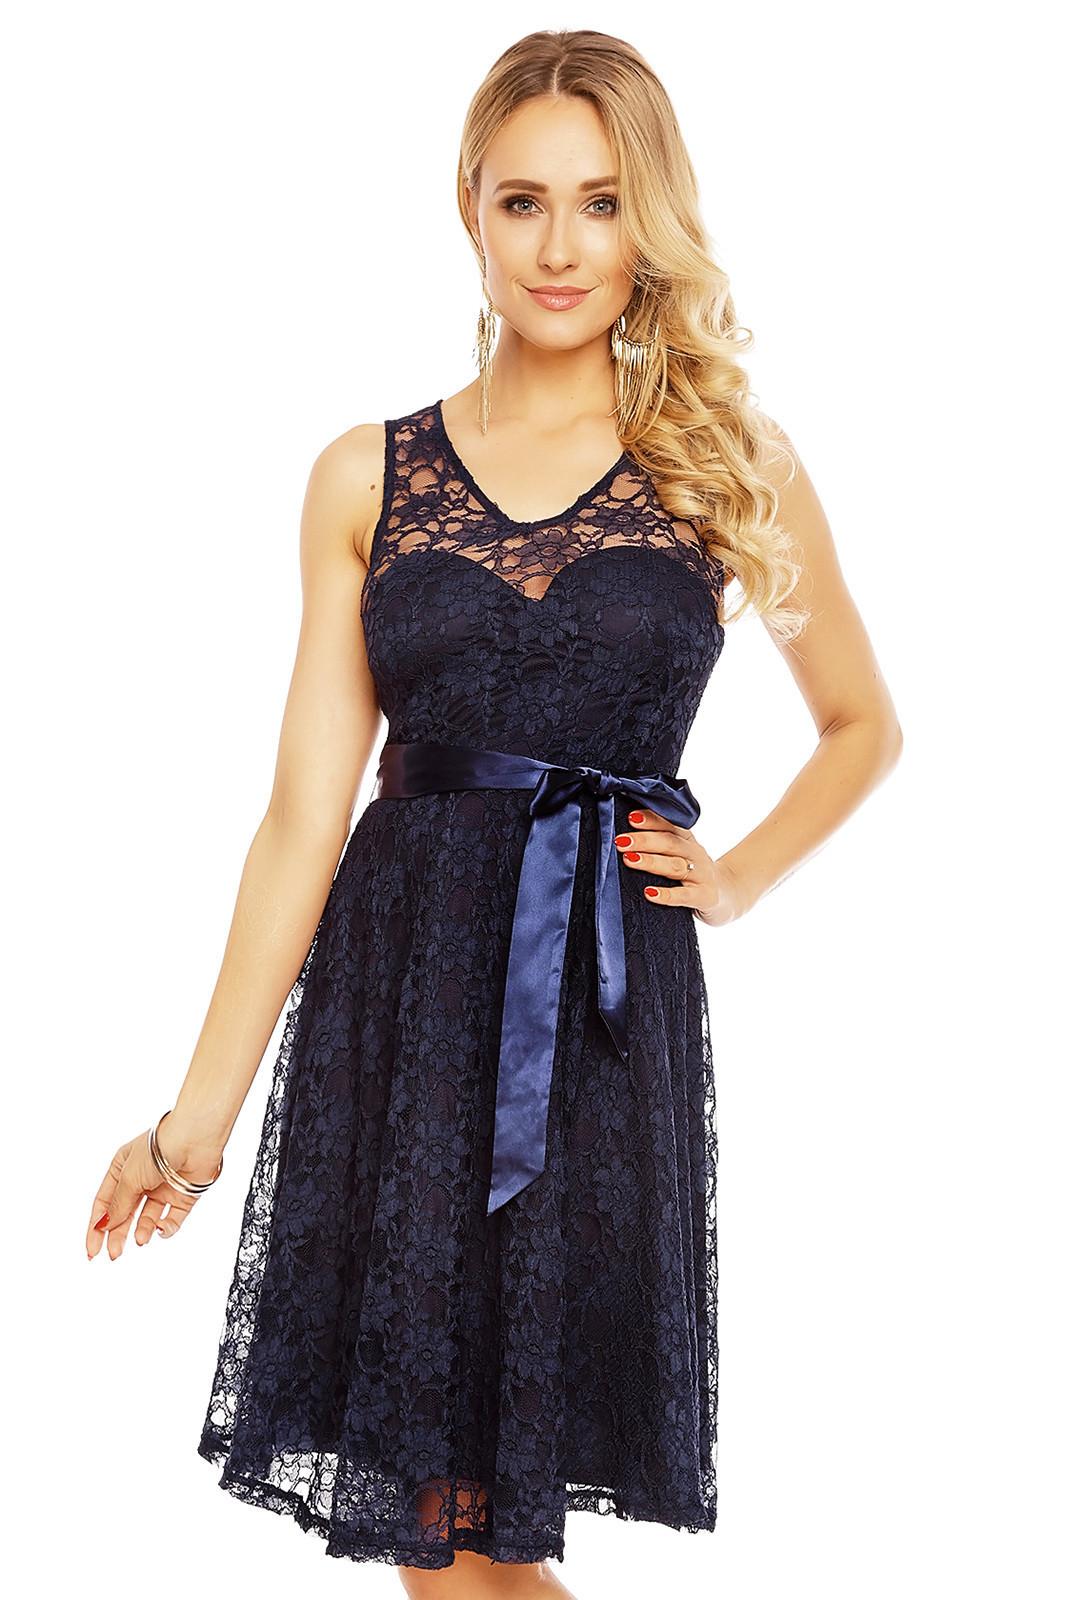 Dámske krajkové šaty na ramienka s opaskom stredne dlhé tmavo modré - Tmavo modrá - MAYAADI tmavo modrá L